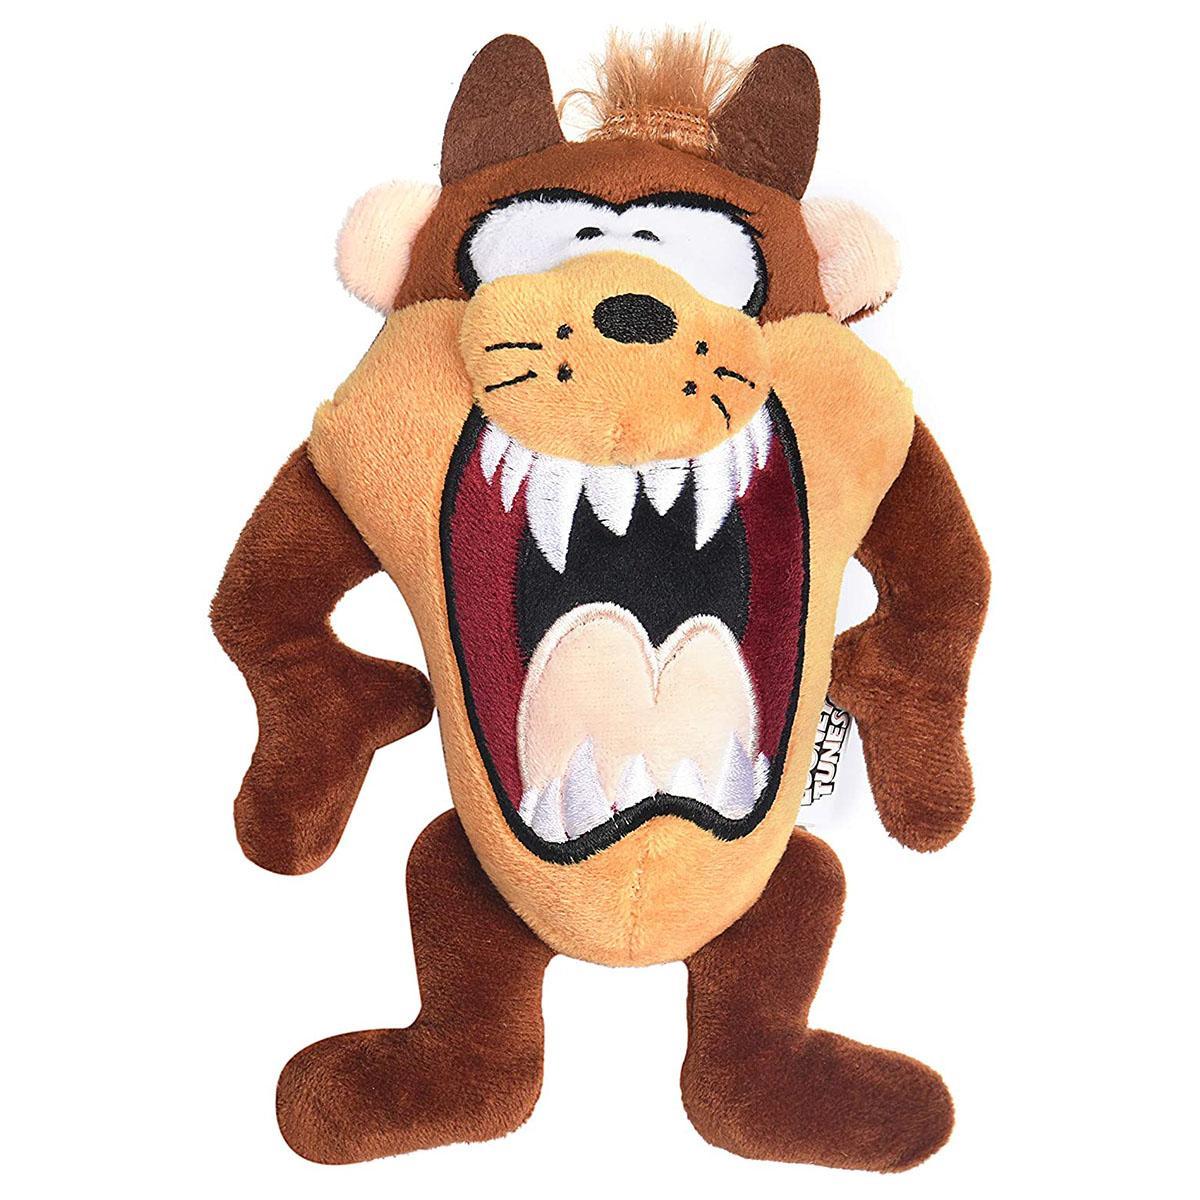 Looney Tunes Taz Big Head Plush Dog Toy